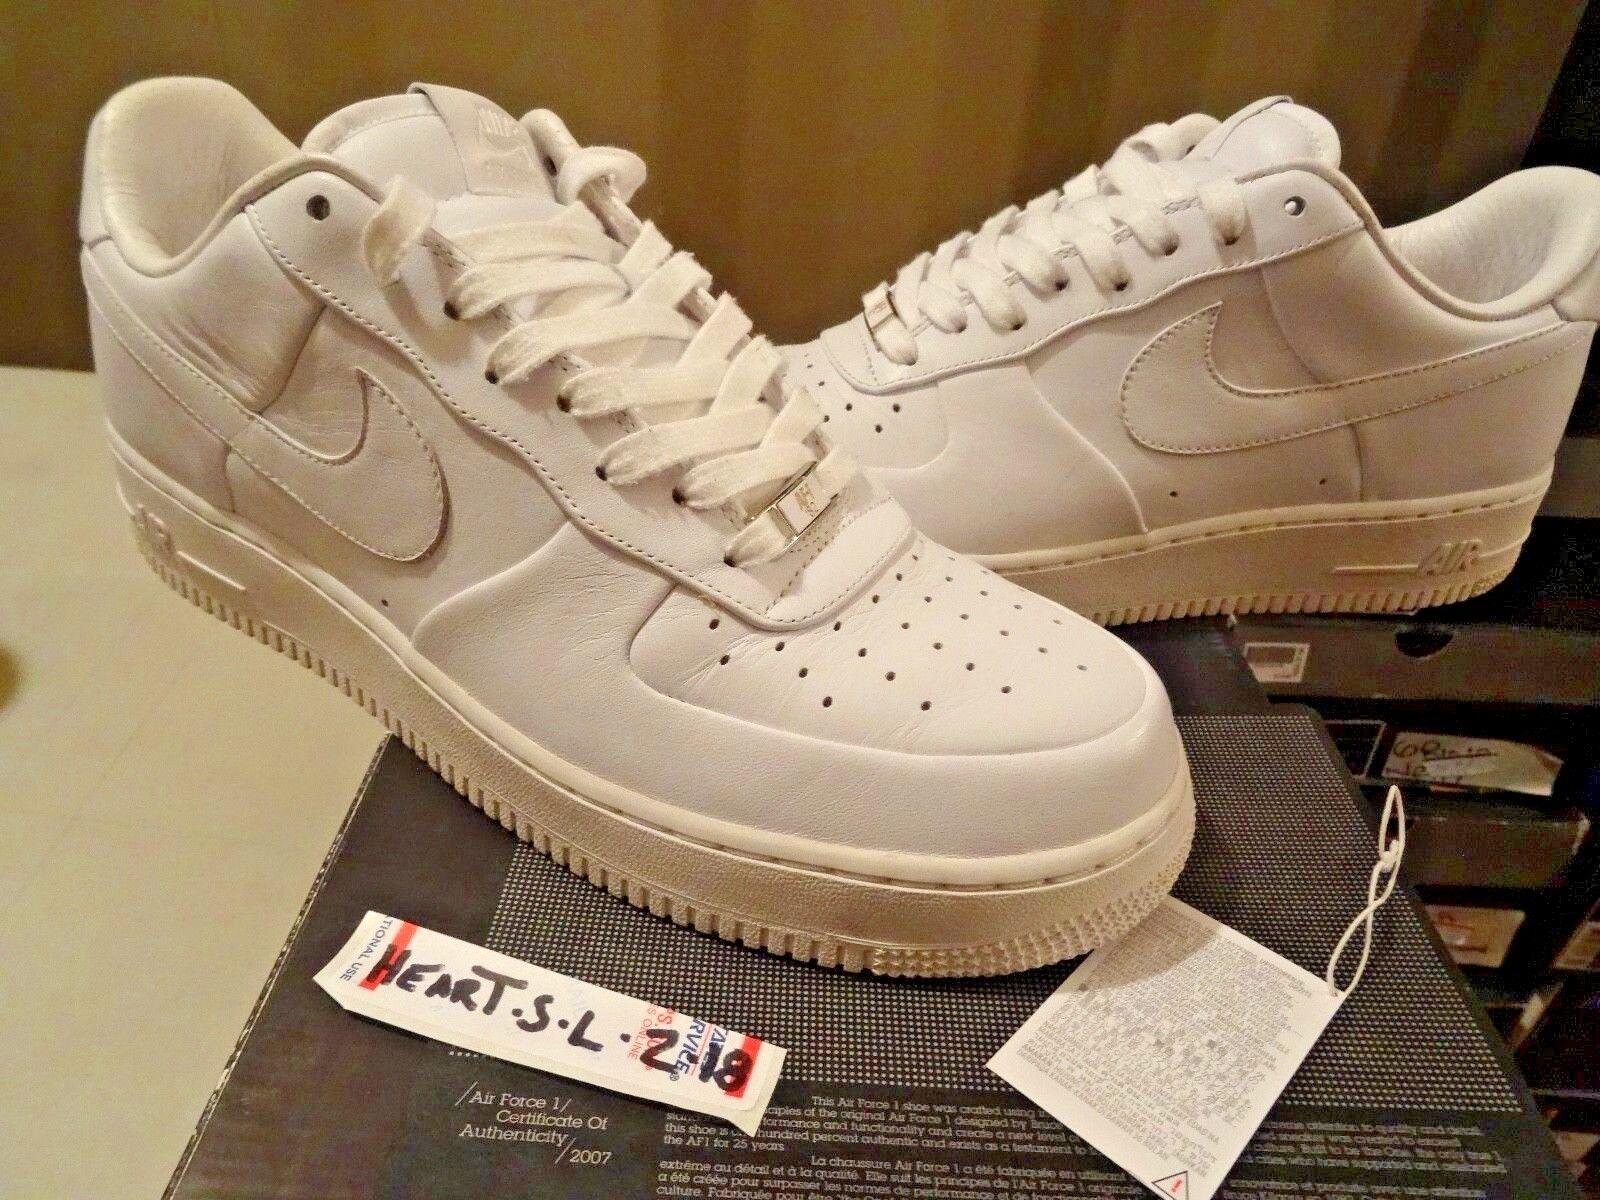 2006 RARE RARE RARE Nike Air Force 1 Supreme '07 bianca 315100 111    bianca, bianca SZ 11 e6b03a